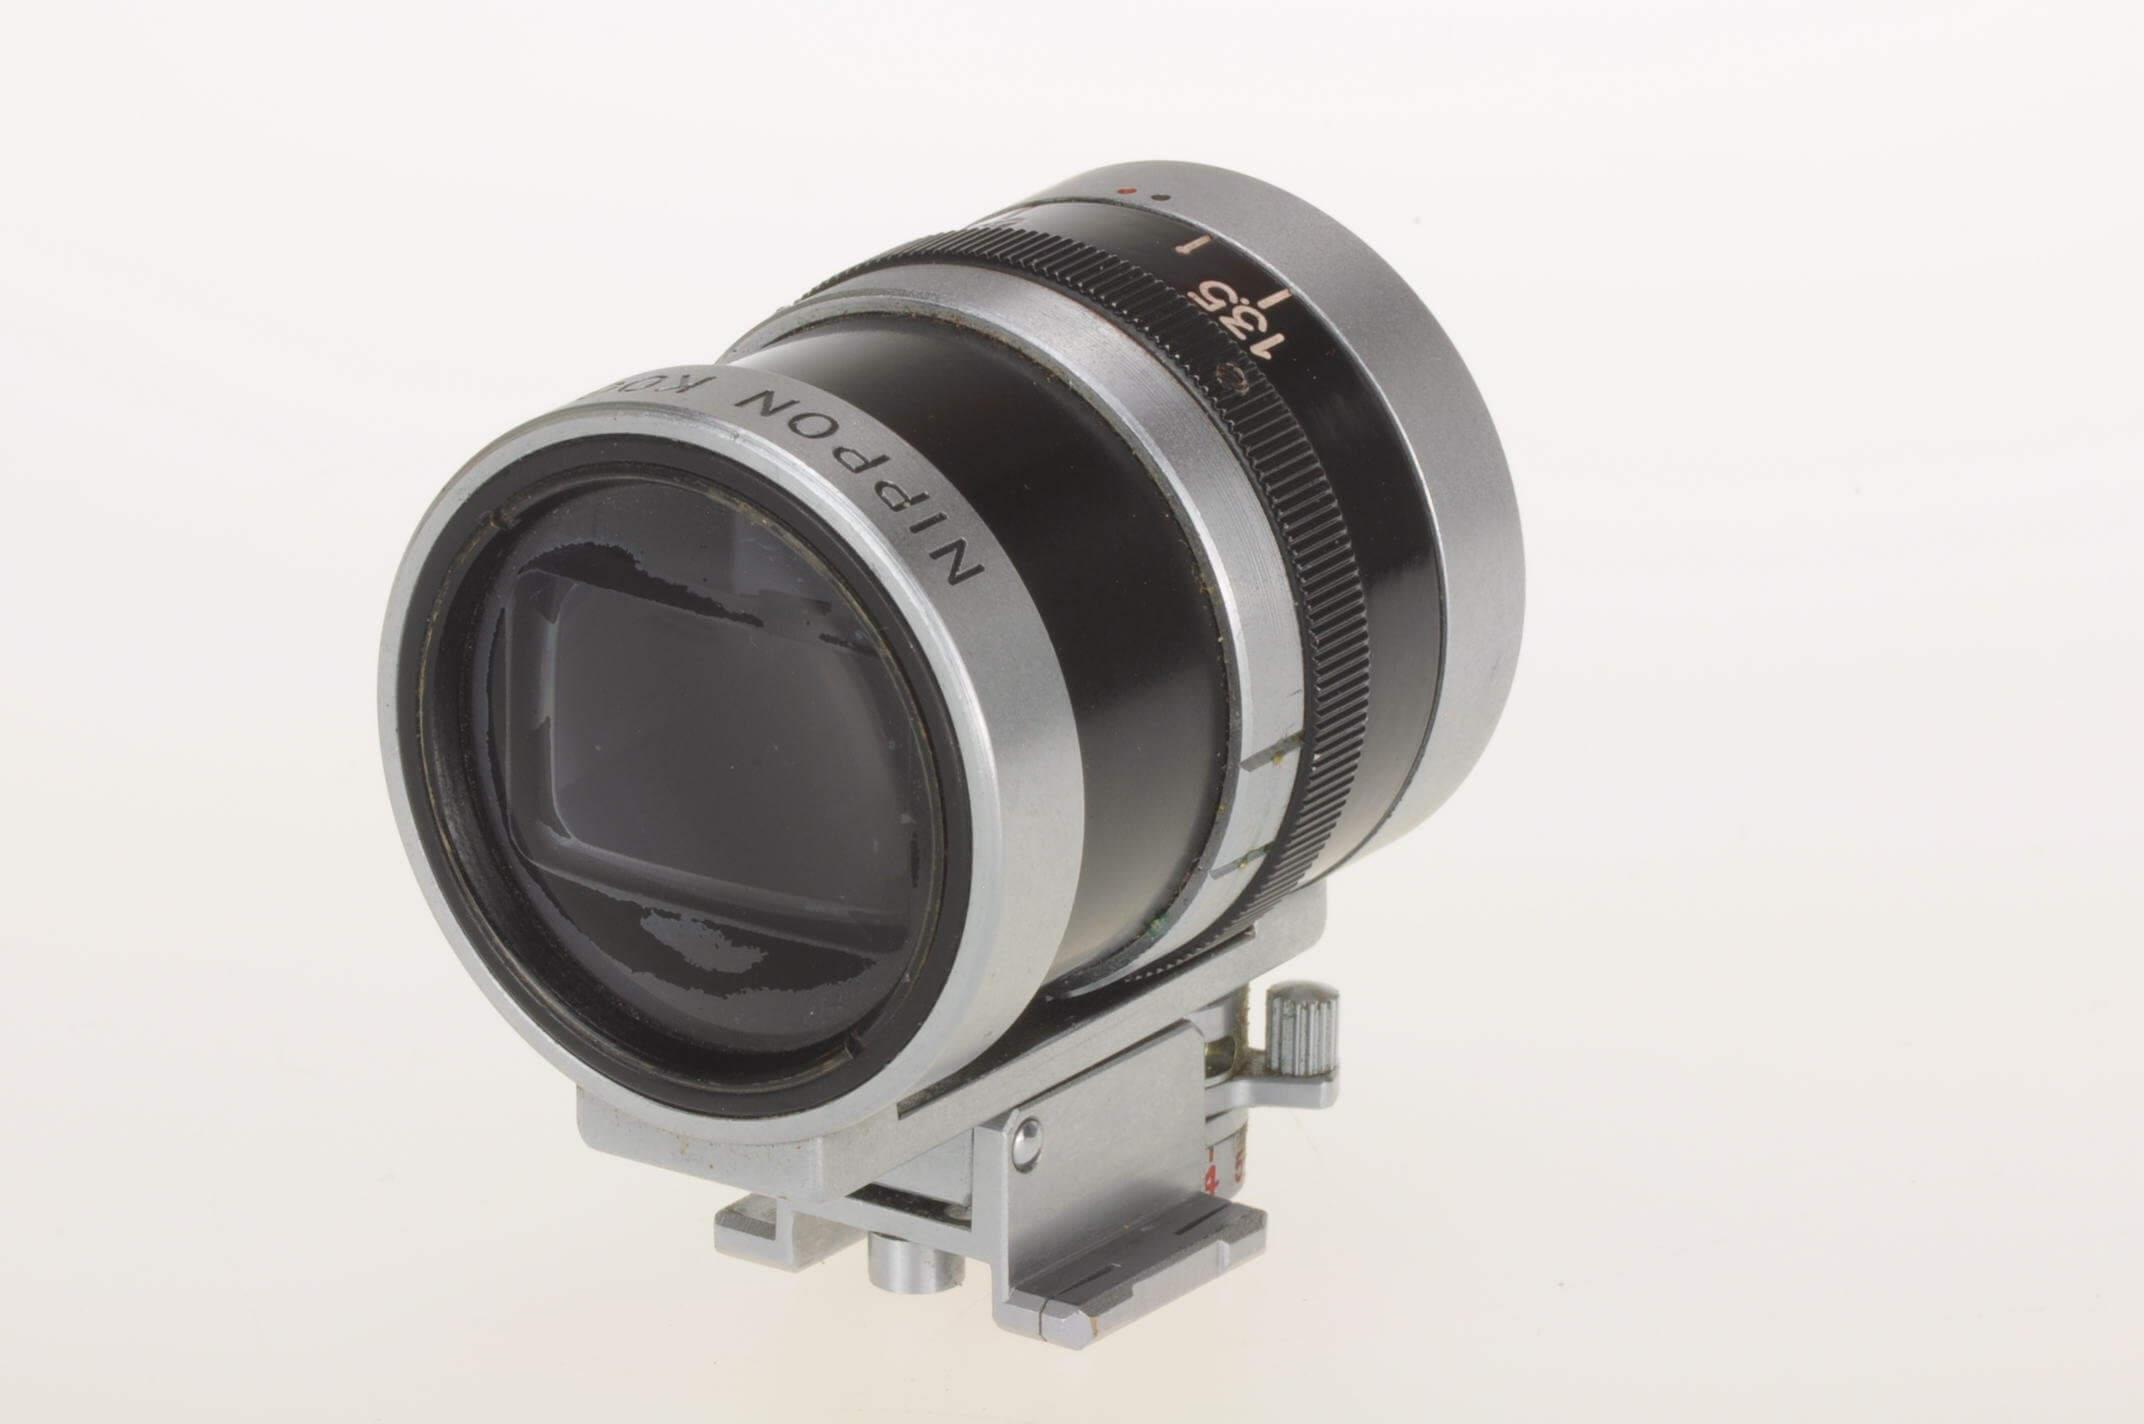 Nikon 35mm-135mm vario finder, excellent condition, for Nikon rangefinder